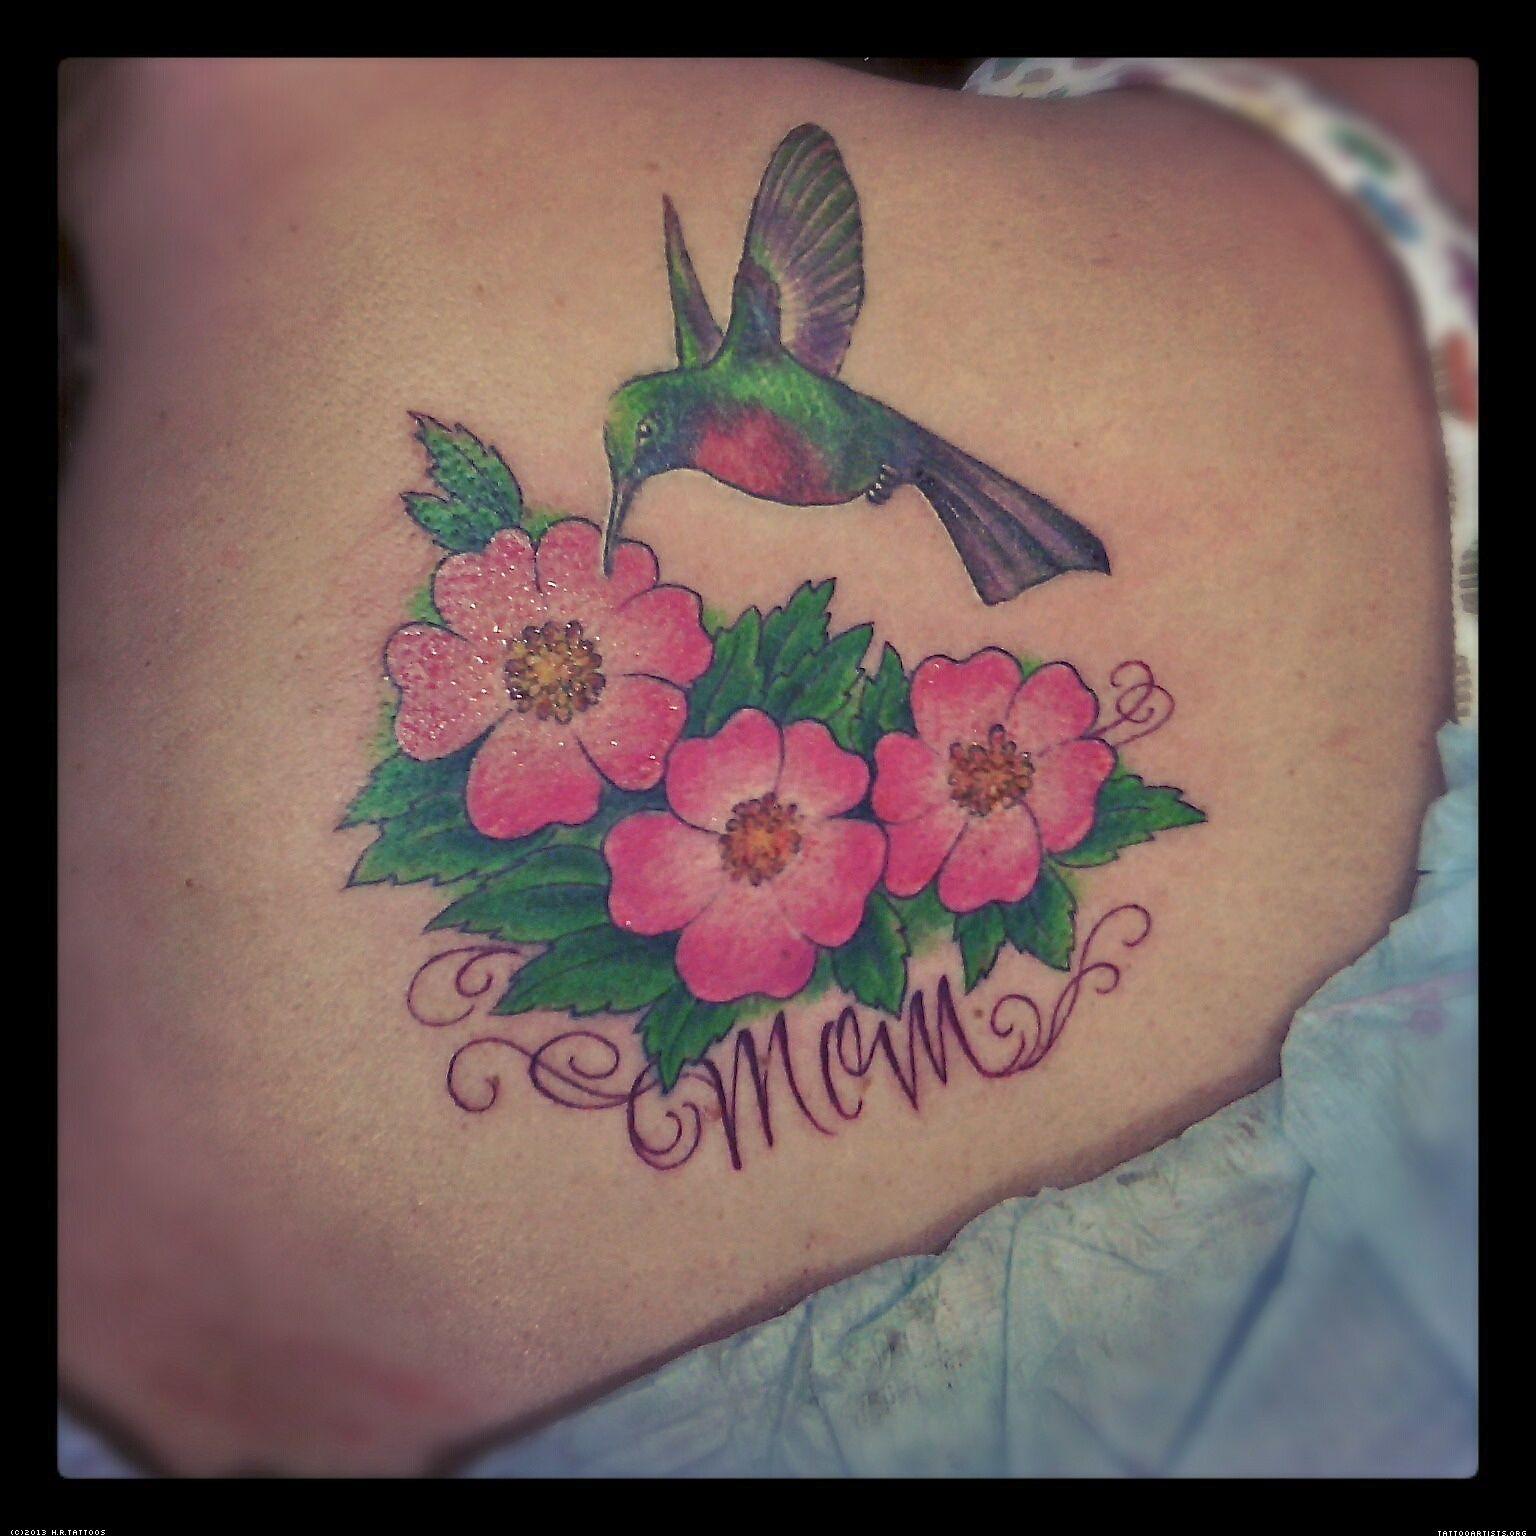 Hummingbird with Flower Tattoo Art Hummingbirdfor her